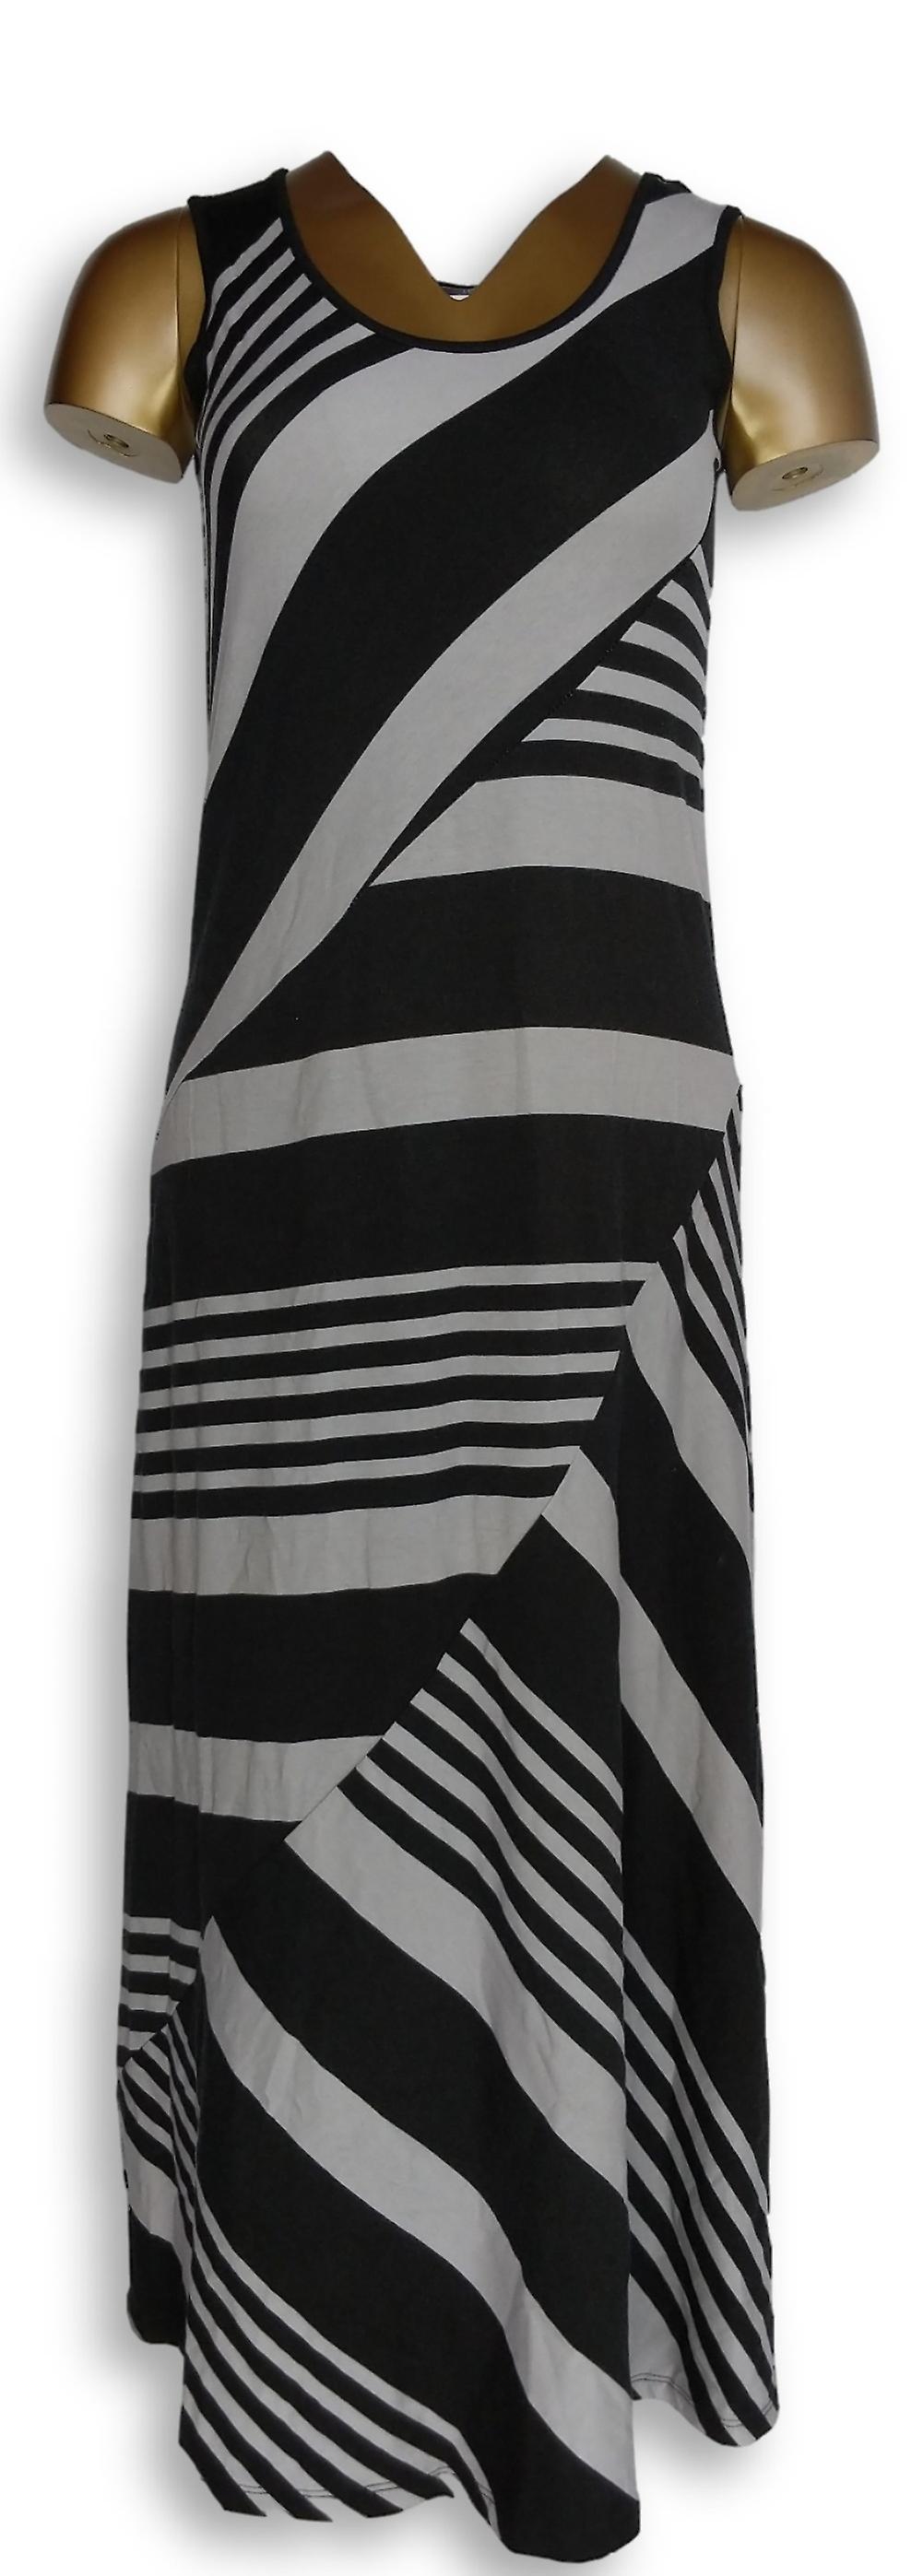 Lisa Rinna Collection Dress Petite Stripe Printed Grey/Black A263133